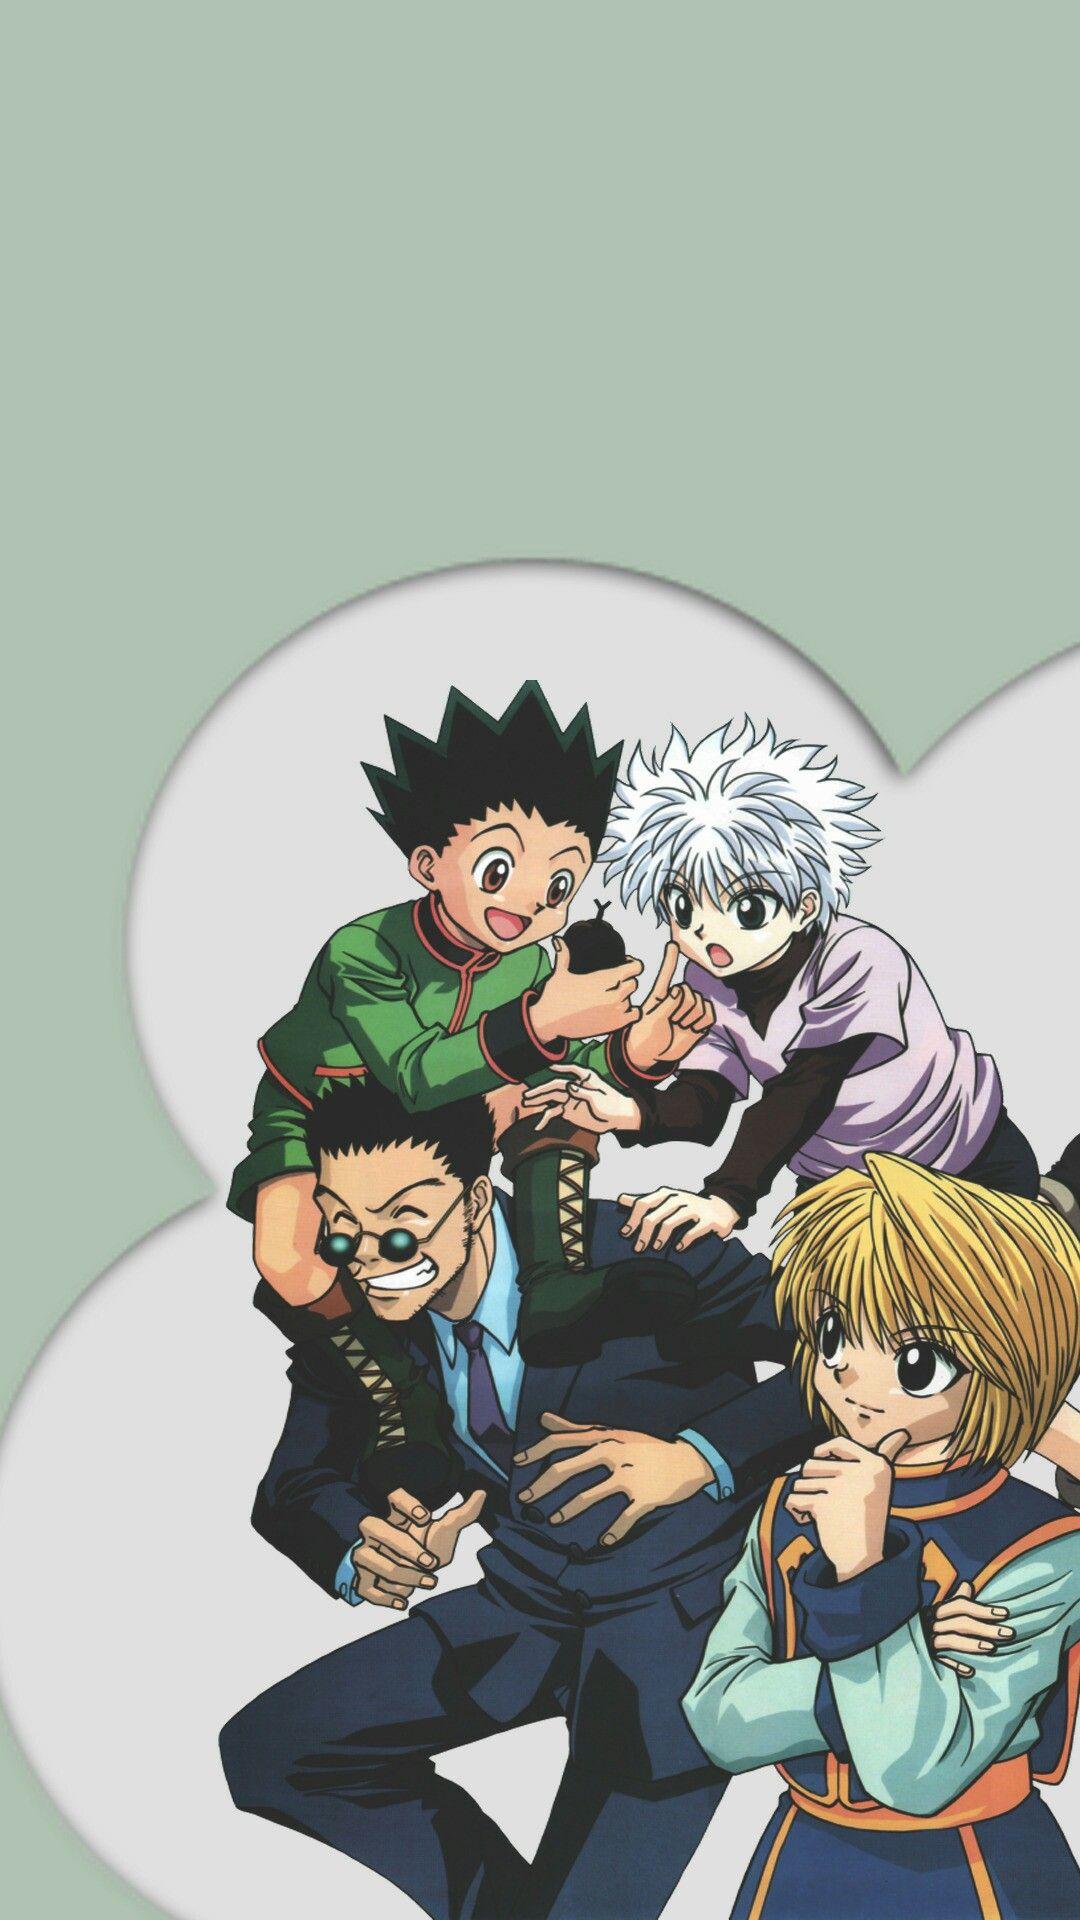 Pin By Shouto On Hunter Hunter Anime Anime Geek Art